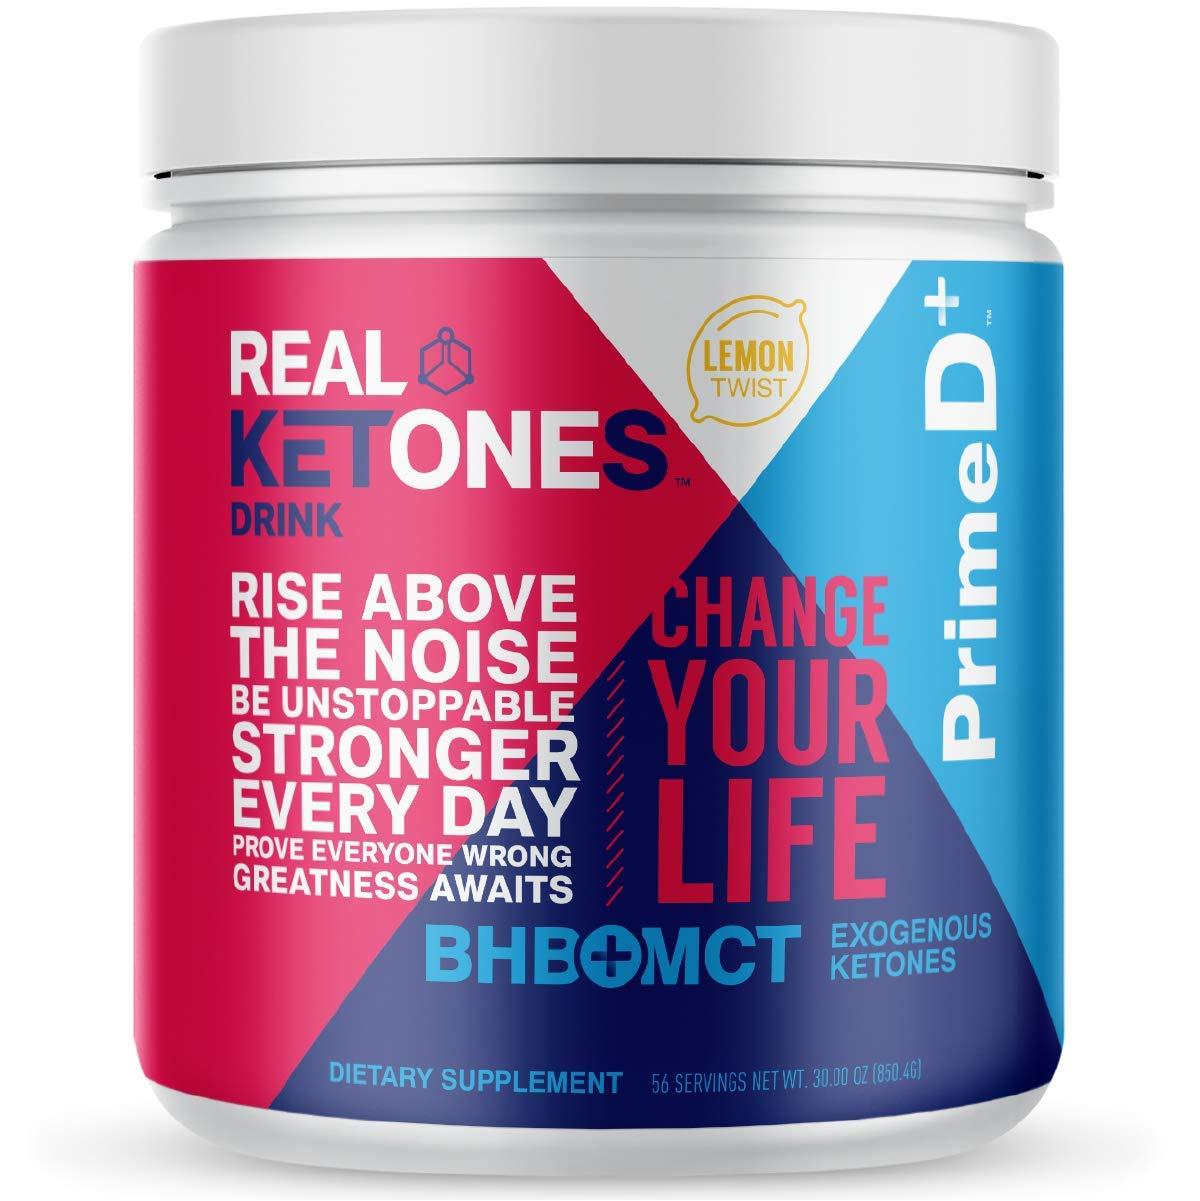 Real Ketones Prime D+ BHB (Beta-Hydroxybuterate) and MCT Exogenous Ketone Powder Supports Ketogenic Diet, Energy Boost, Mental Clarity (Lemon Twist) (56 Serving) by KEGENIX